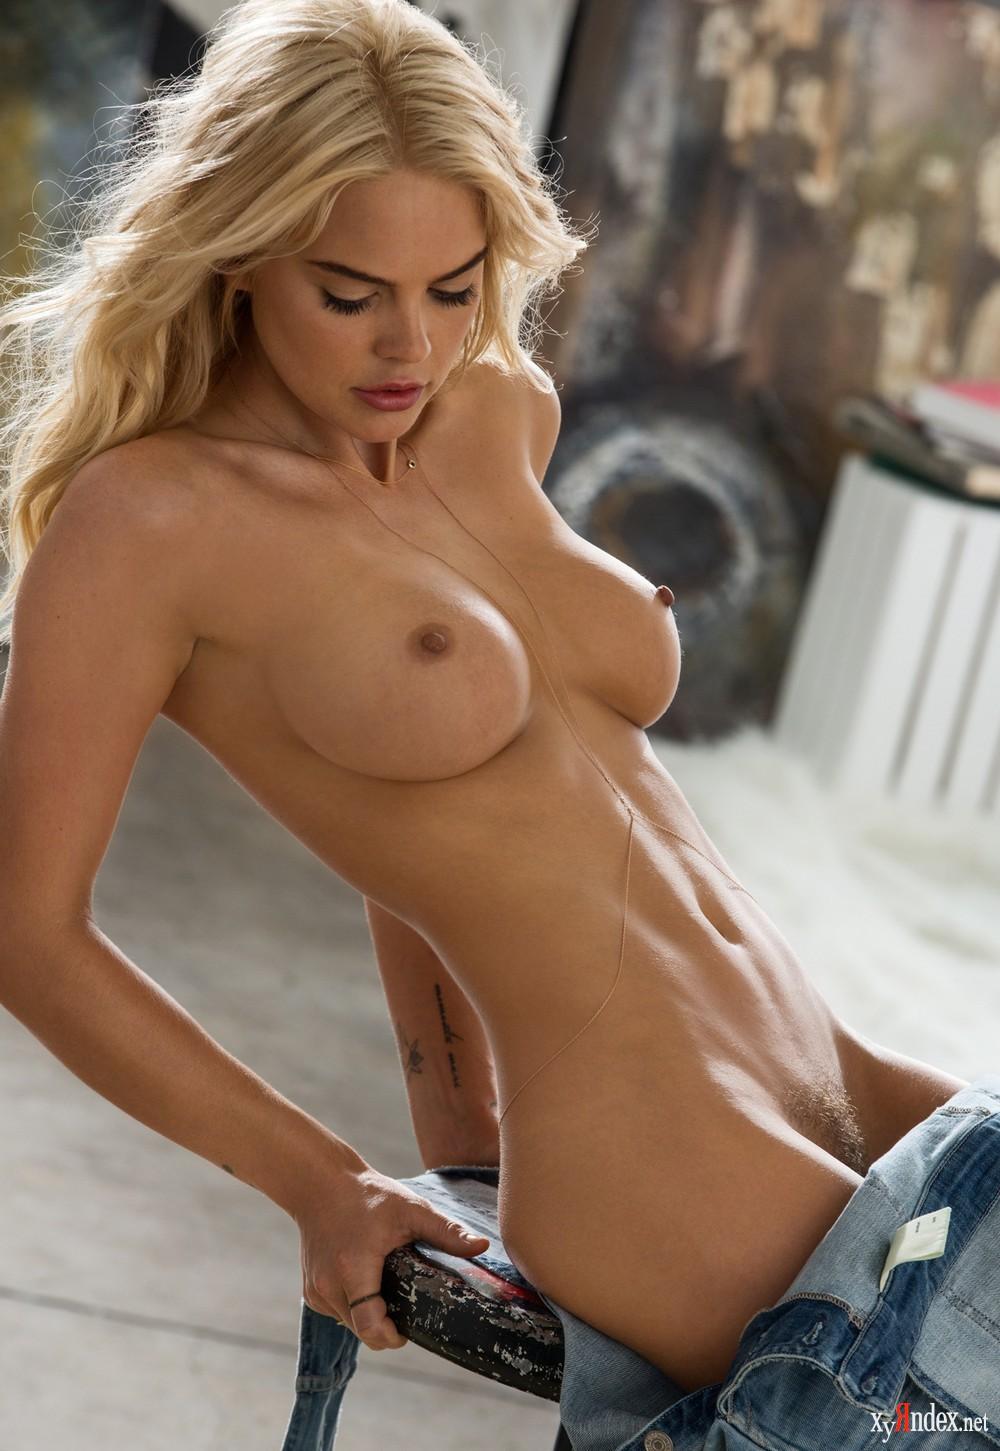 Playboy girls naked galleries